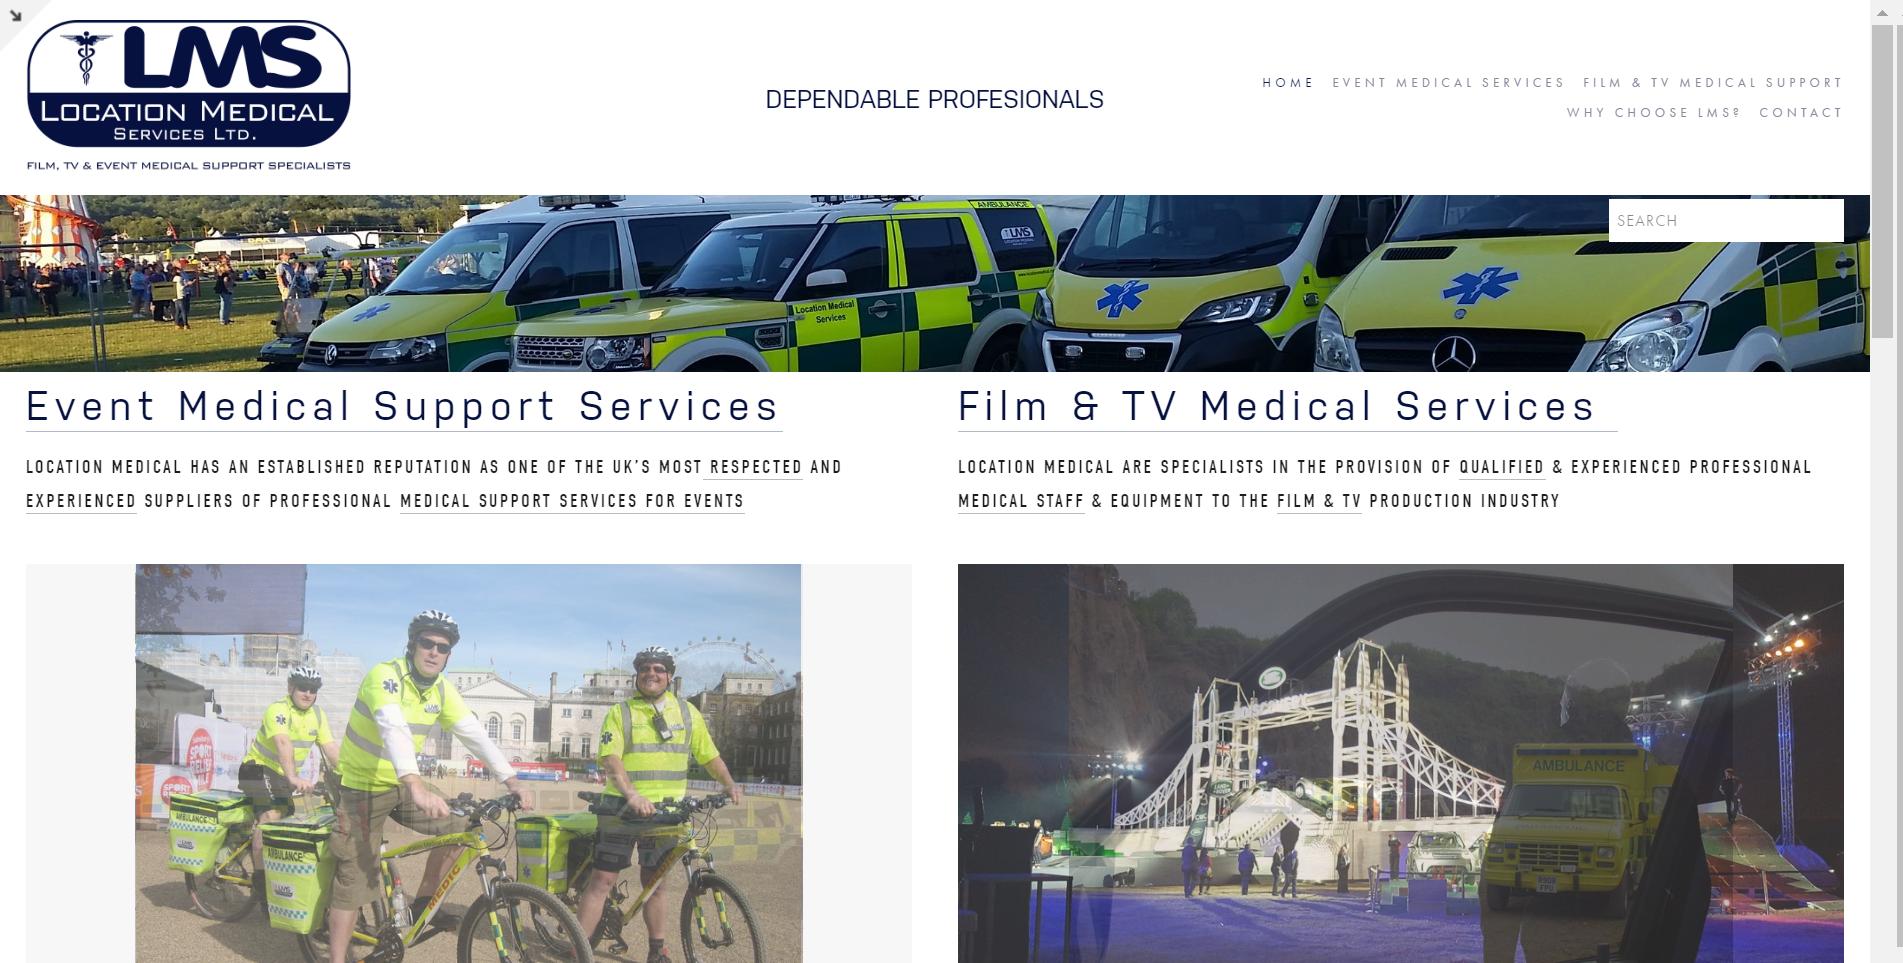 LMS New Site